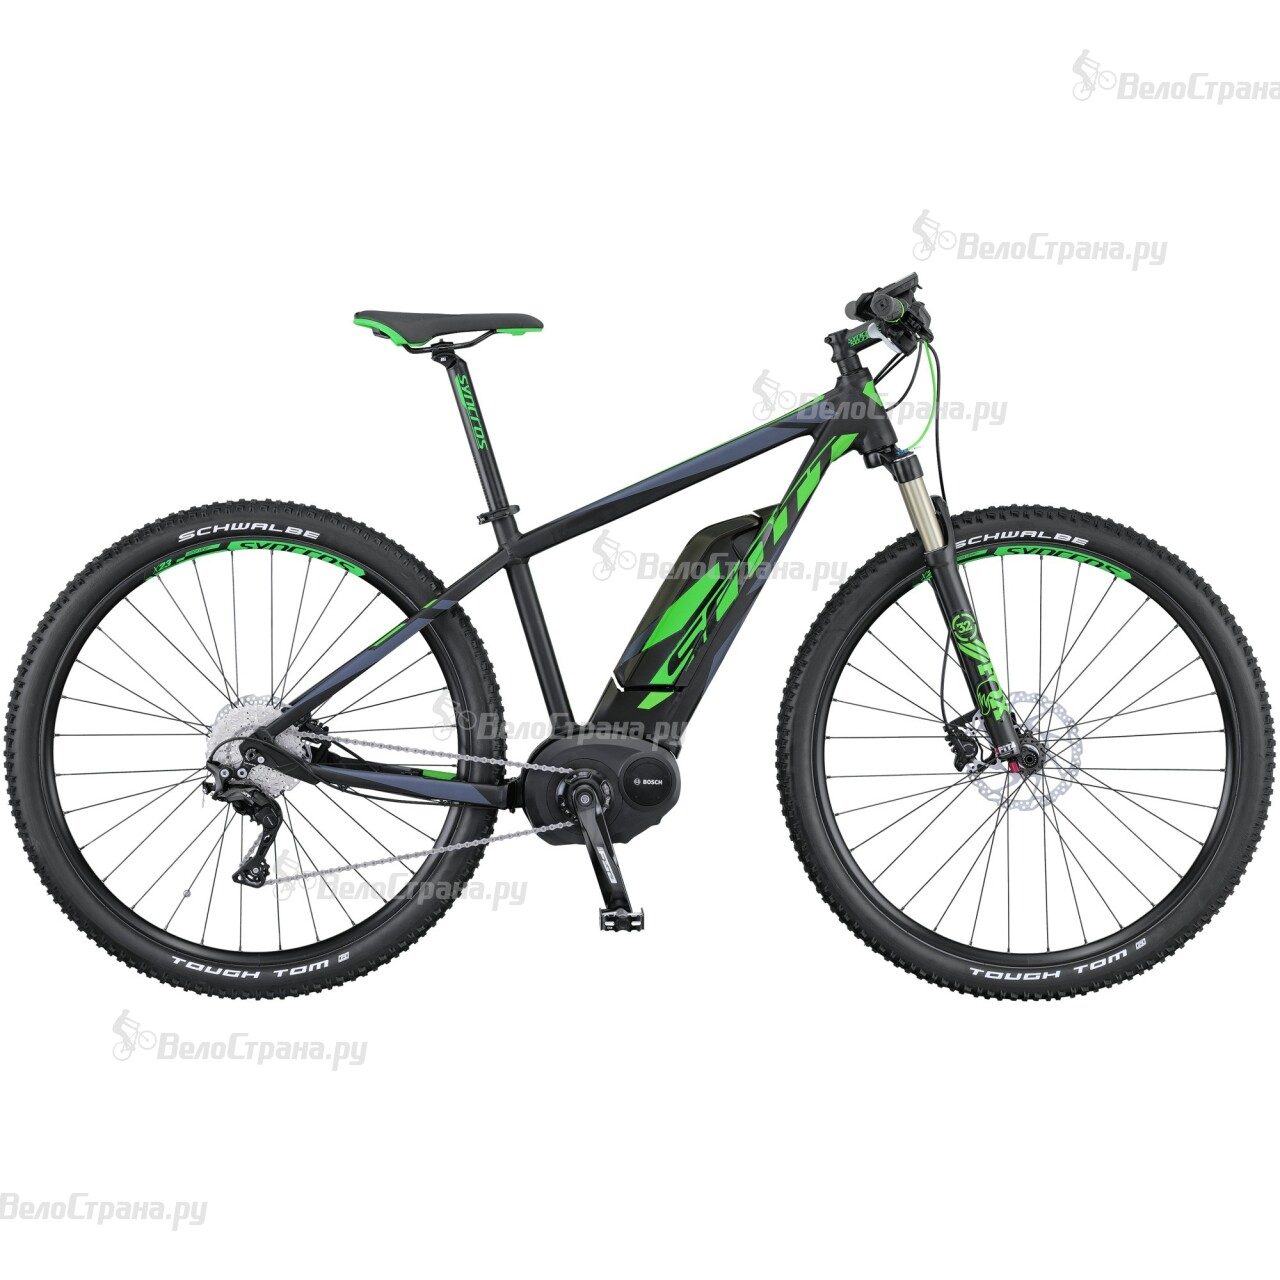 Велосипед Scott E-Aspect 910 (2016) велосипед scott aspect 700 27 5 2016